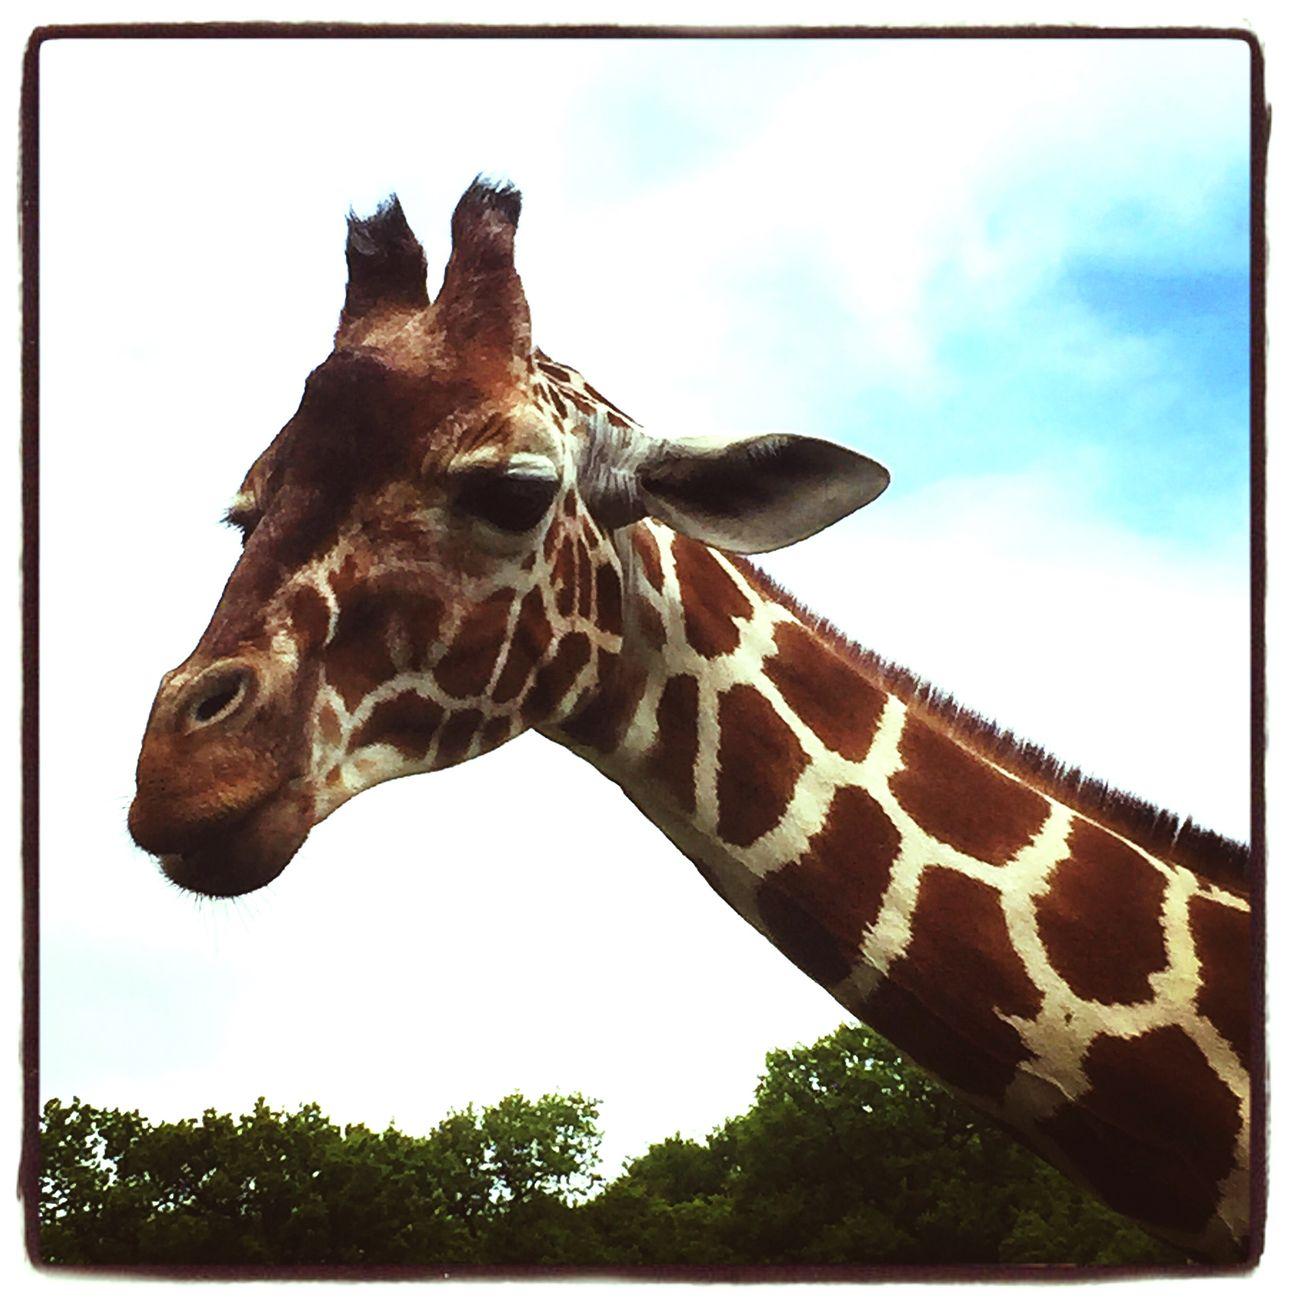 Giraffe Giraffes Animal Photography Animals Whipsnade Zoo Zoo Animals  Animal_collection